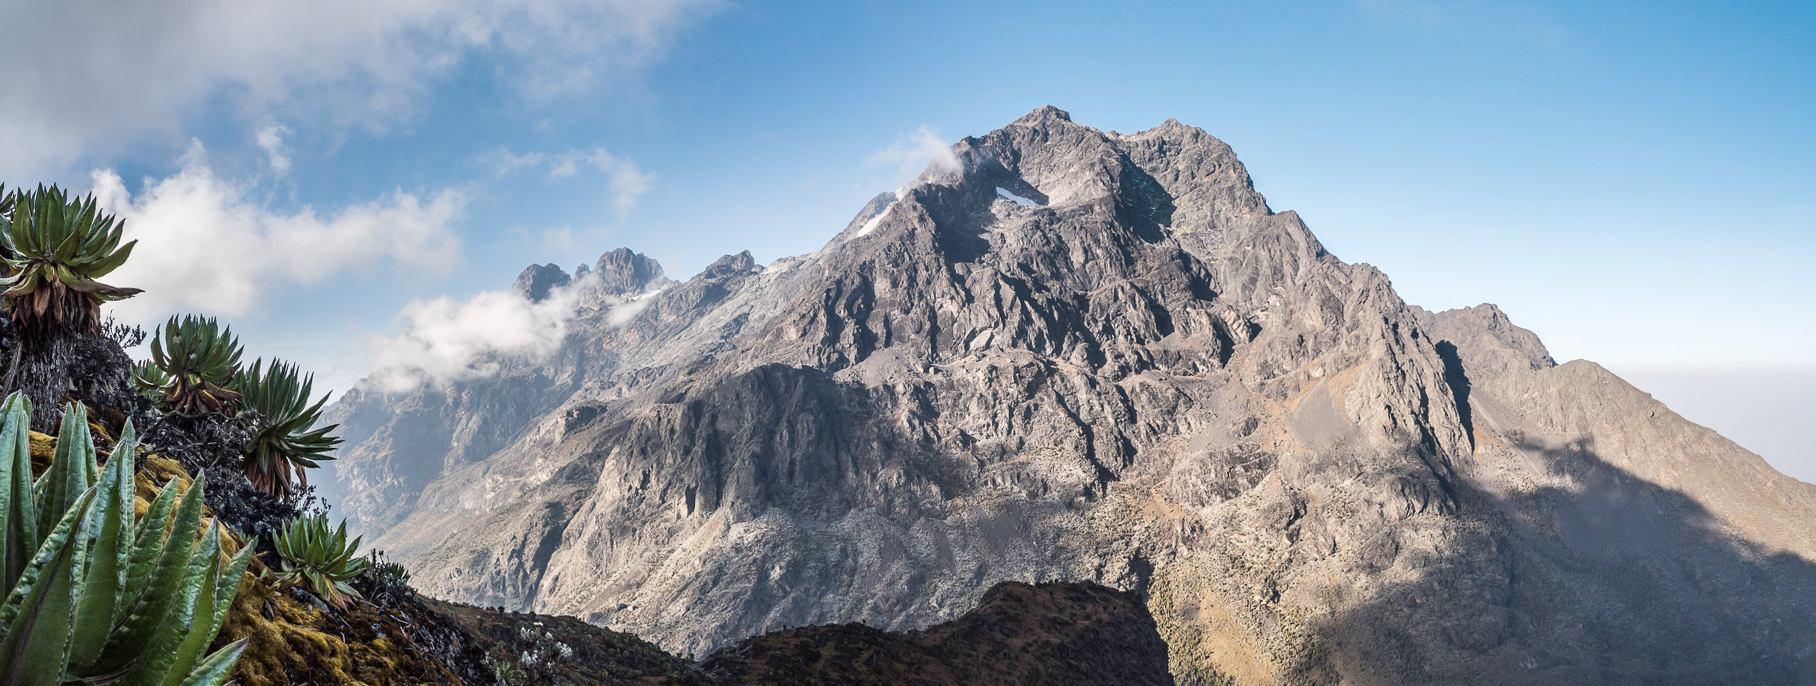 Hike the Rwenzori Mountains